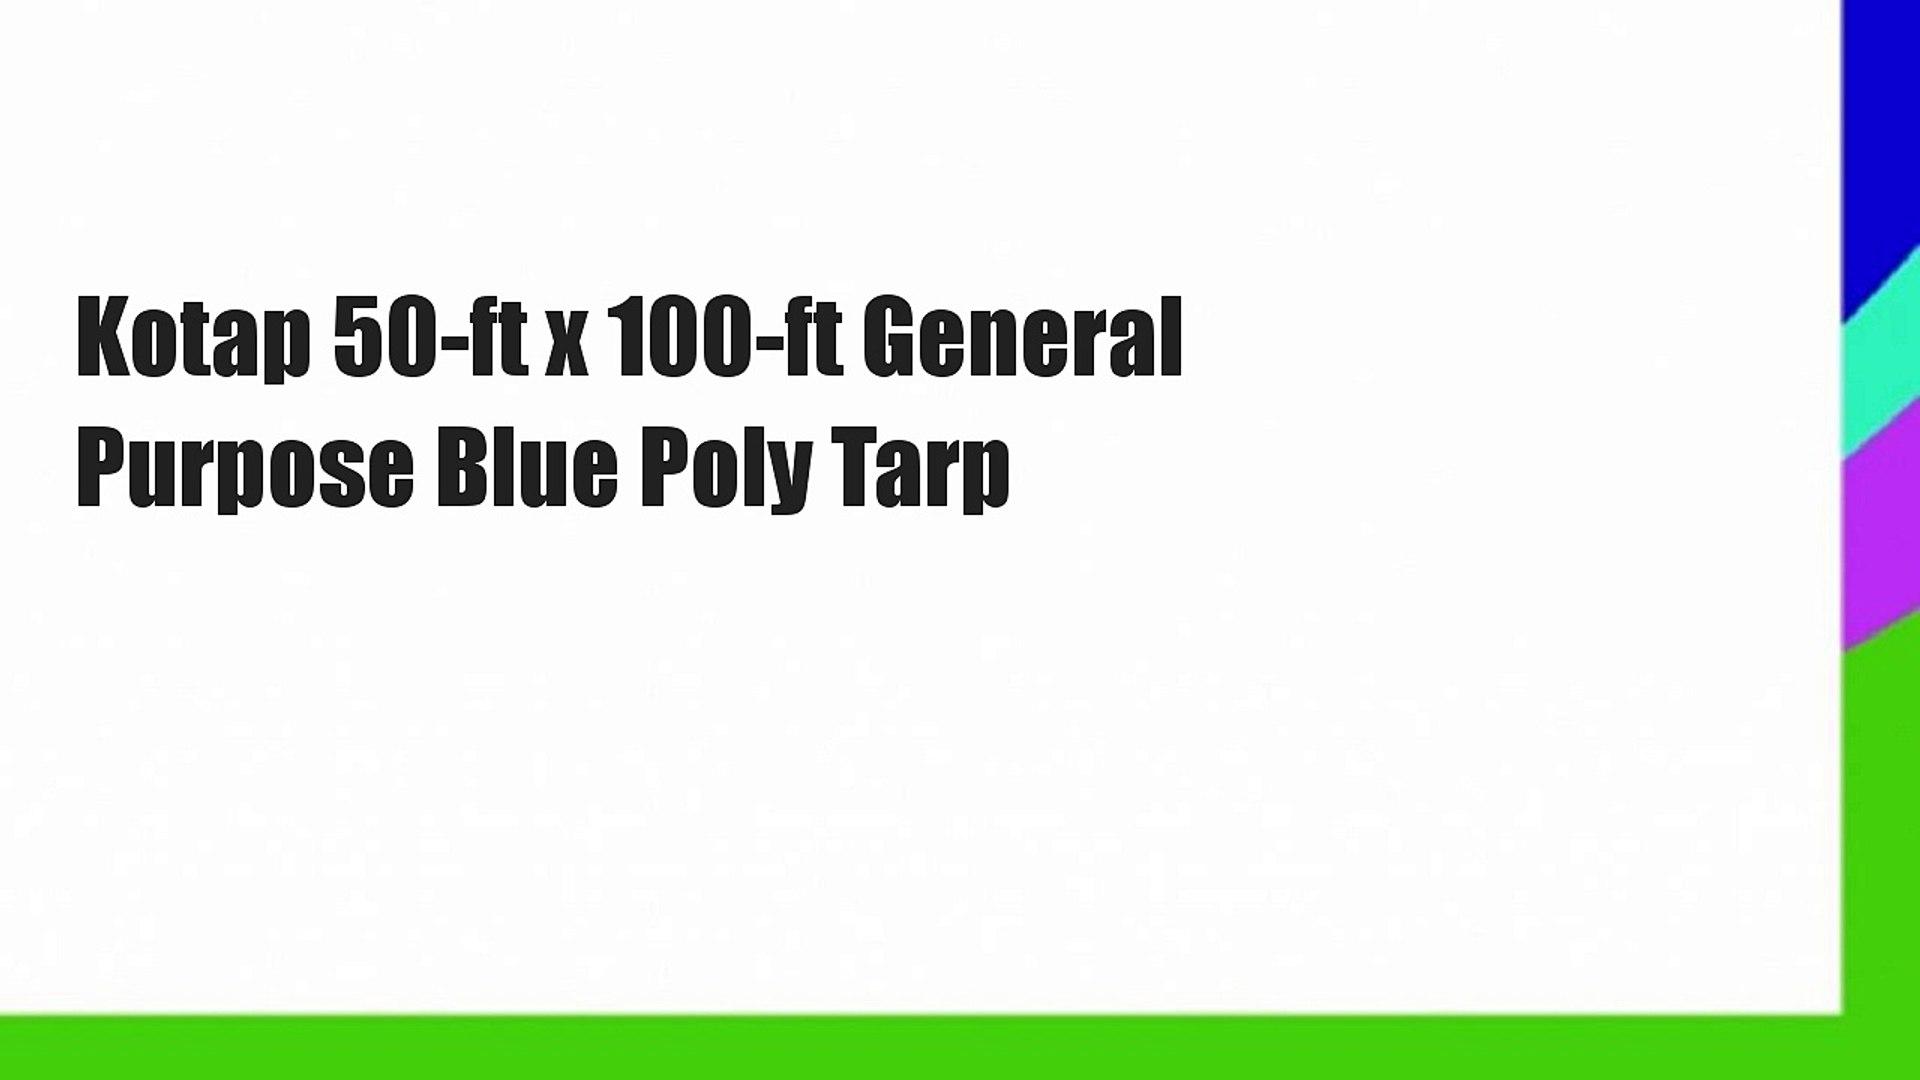 Premium Heavy Duty Multi-Purpose Waterproof Poly Tarp Cover 20 ft x 40 ft Reversible Green and Brown